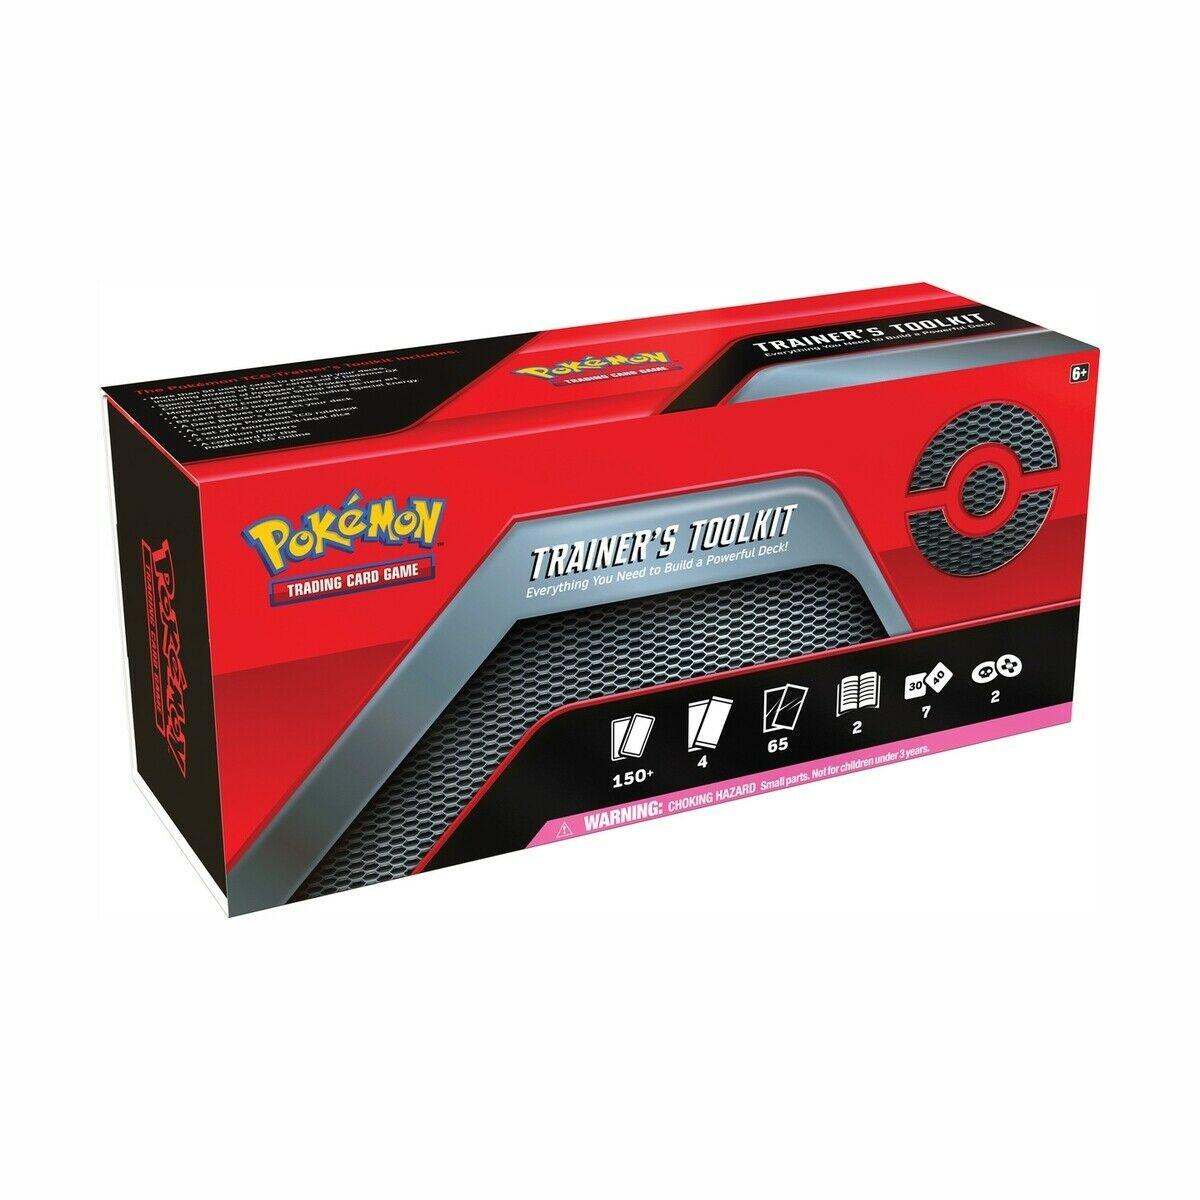 Pokemon TCG Trainer's Toolkit Box 4 Booster Packs Sealed 2 Dedenne GX